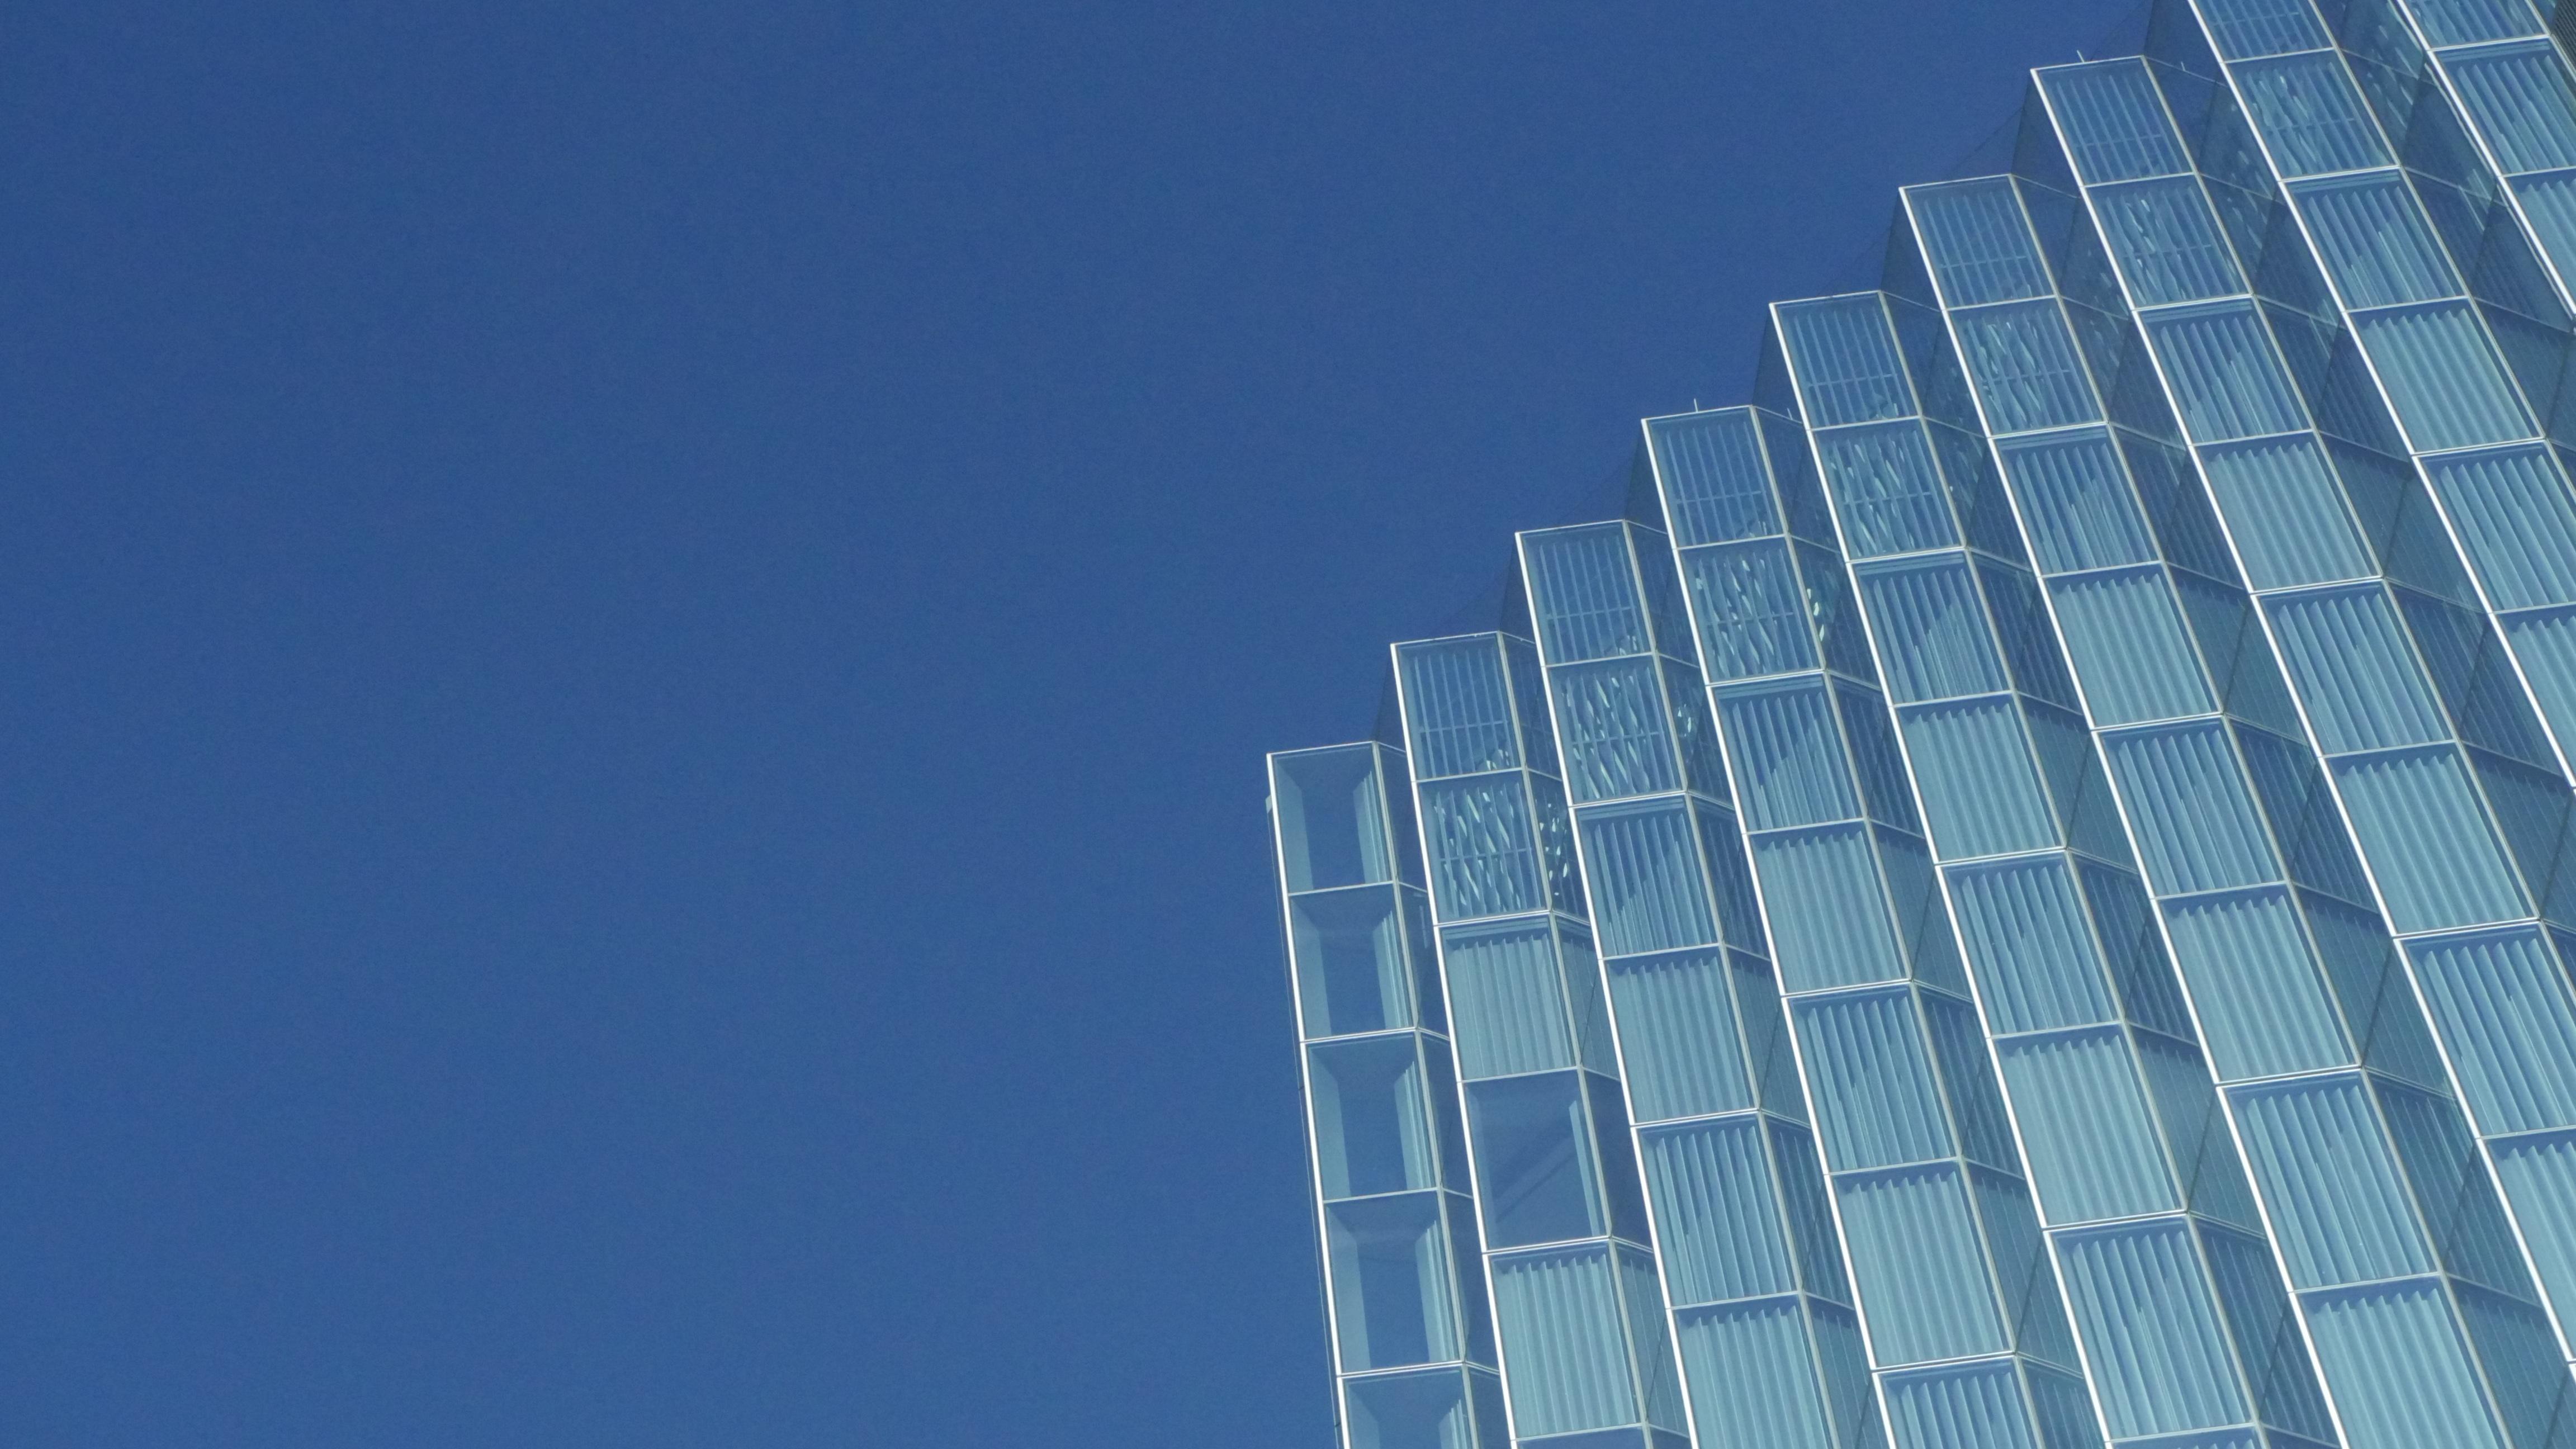 sky-technology-skyscraper-line-tower-mas